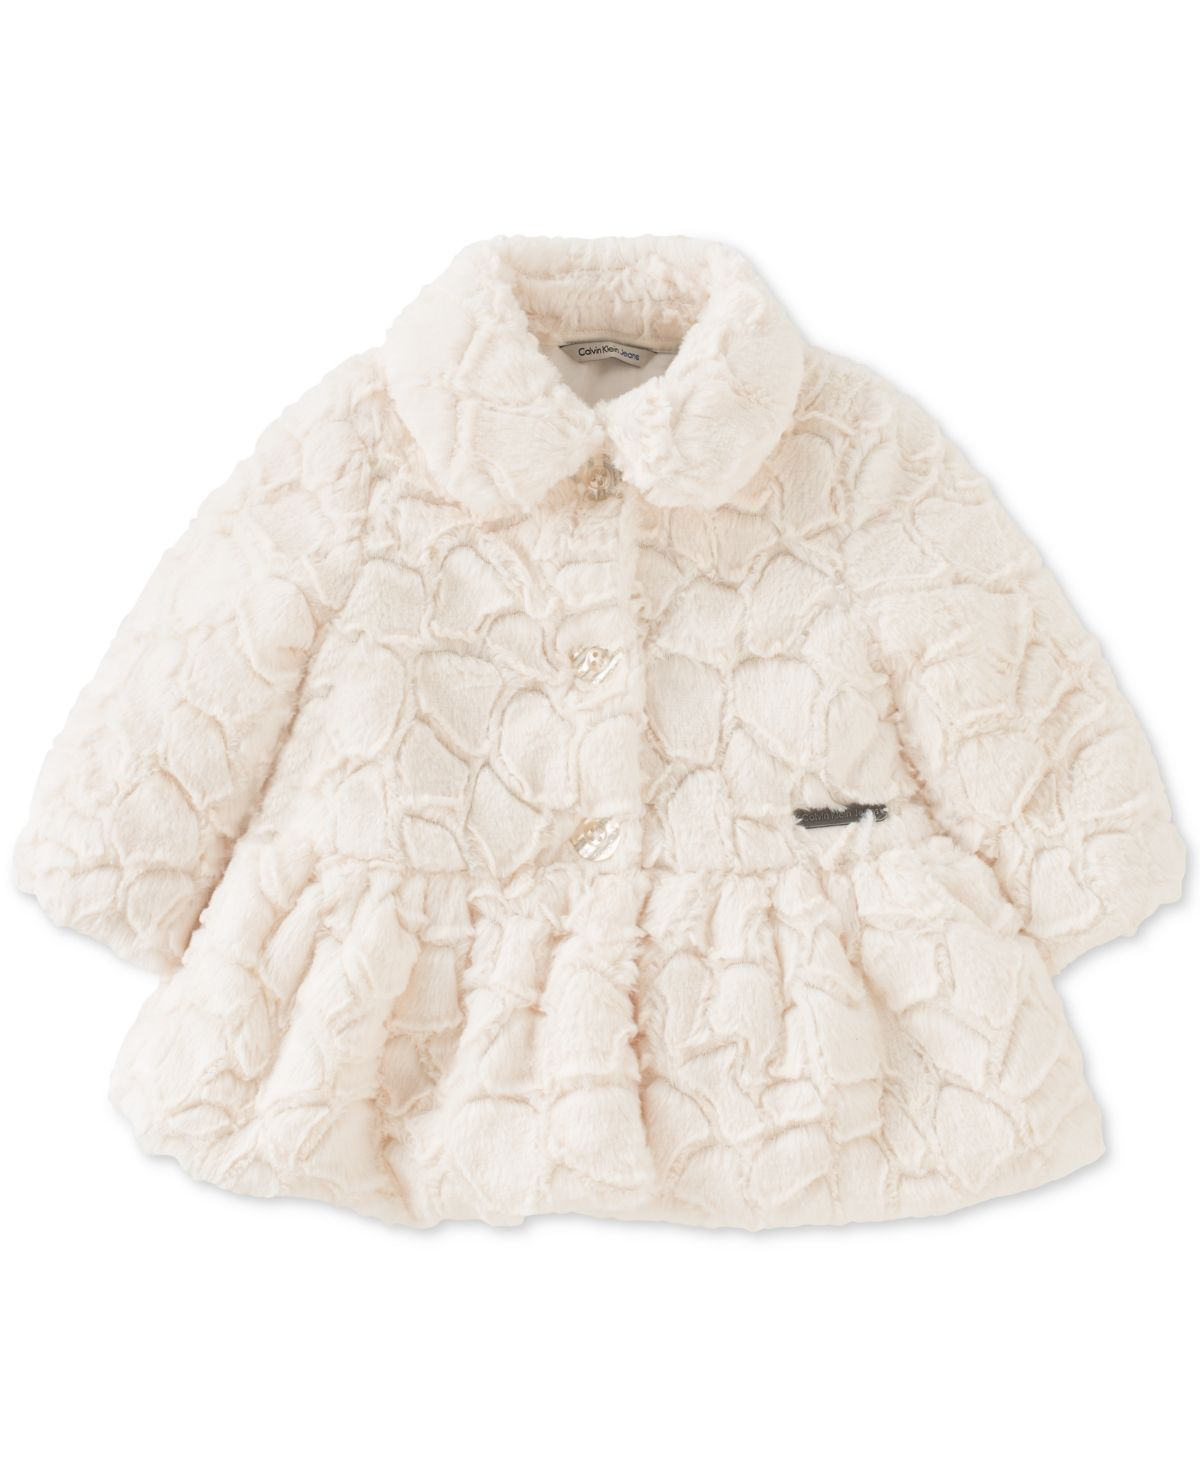 Calvin Klein Baby Girls Embossed Faux Fur Coat Reviews Coats Jackets Kids Macy S White Faux Fur Coat Fur Coat Peplum Coat